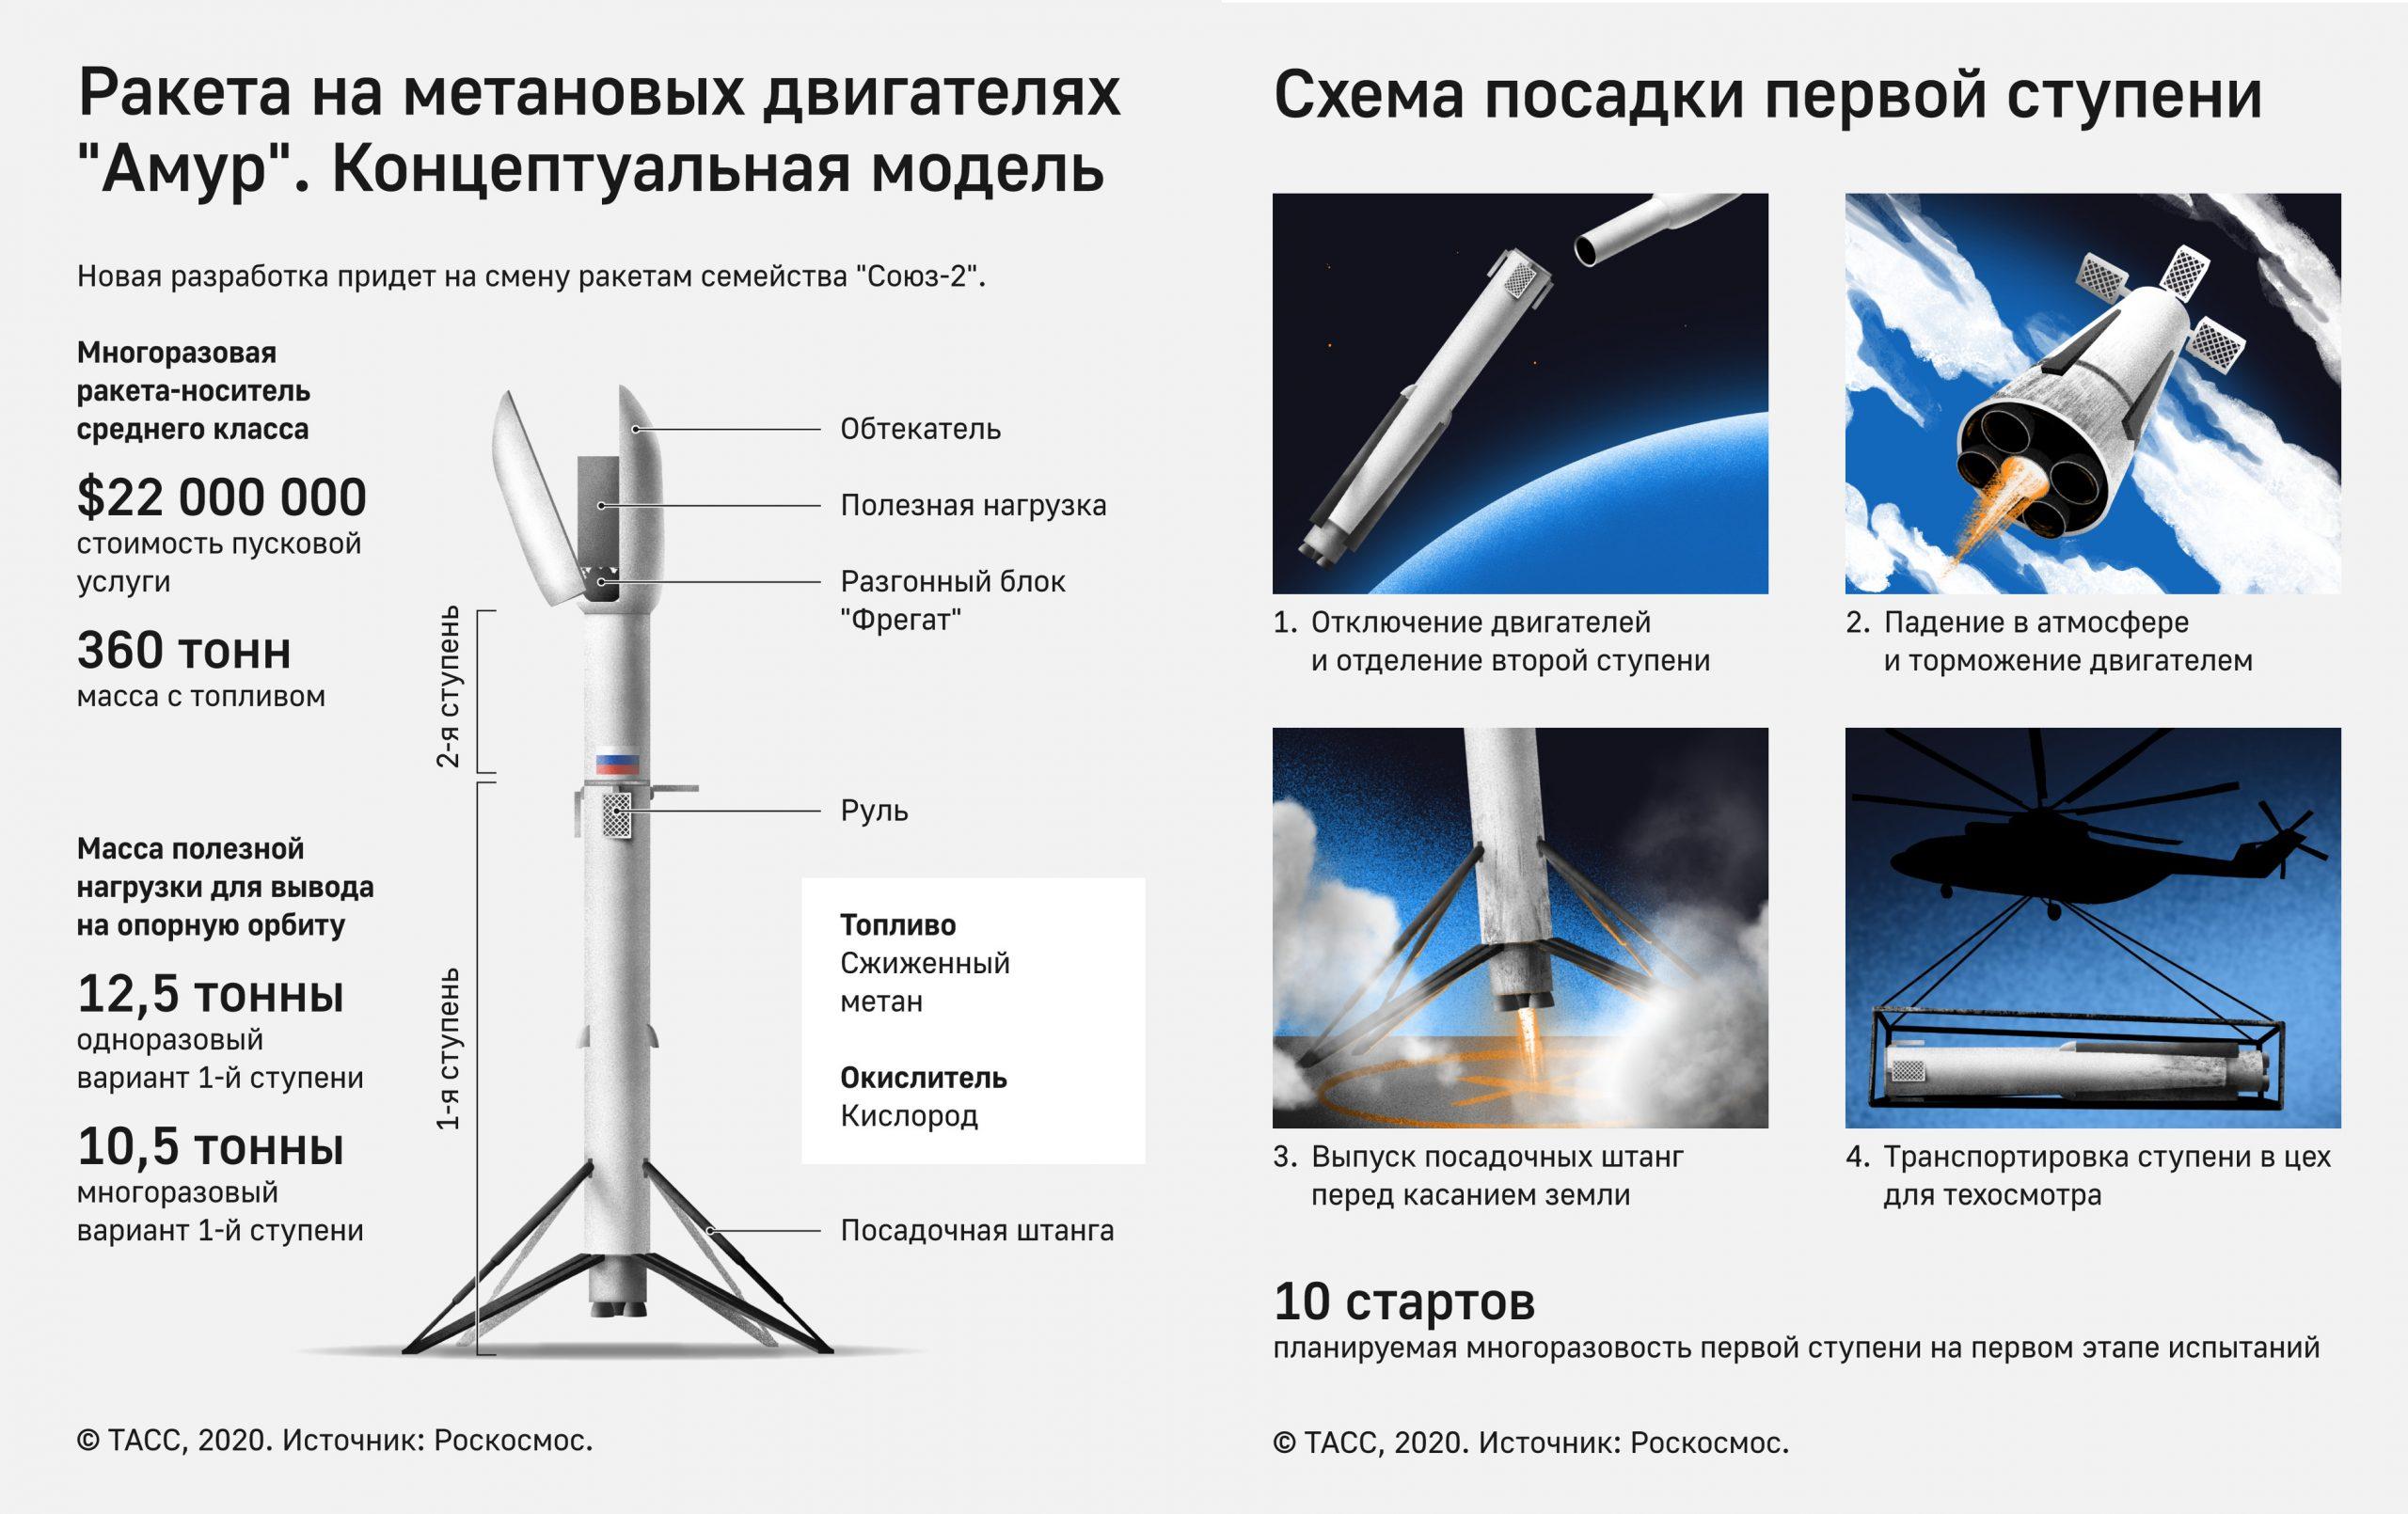 Ракета Амур